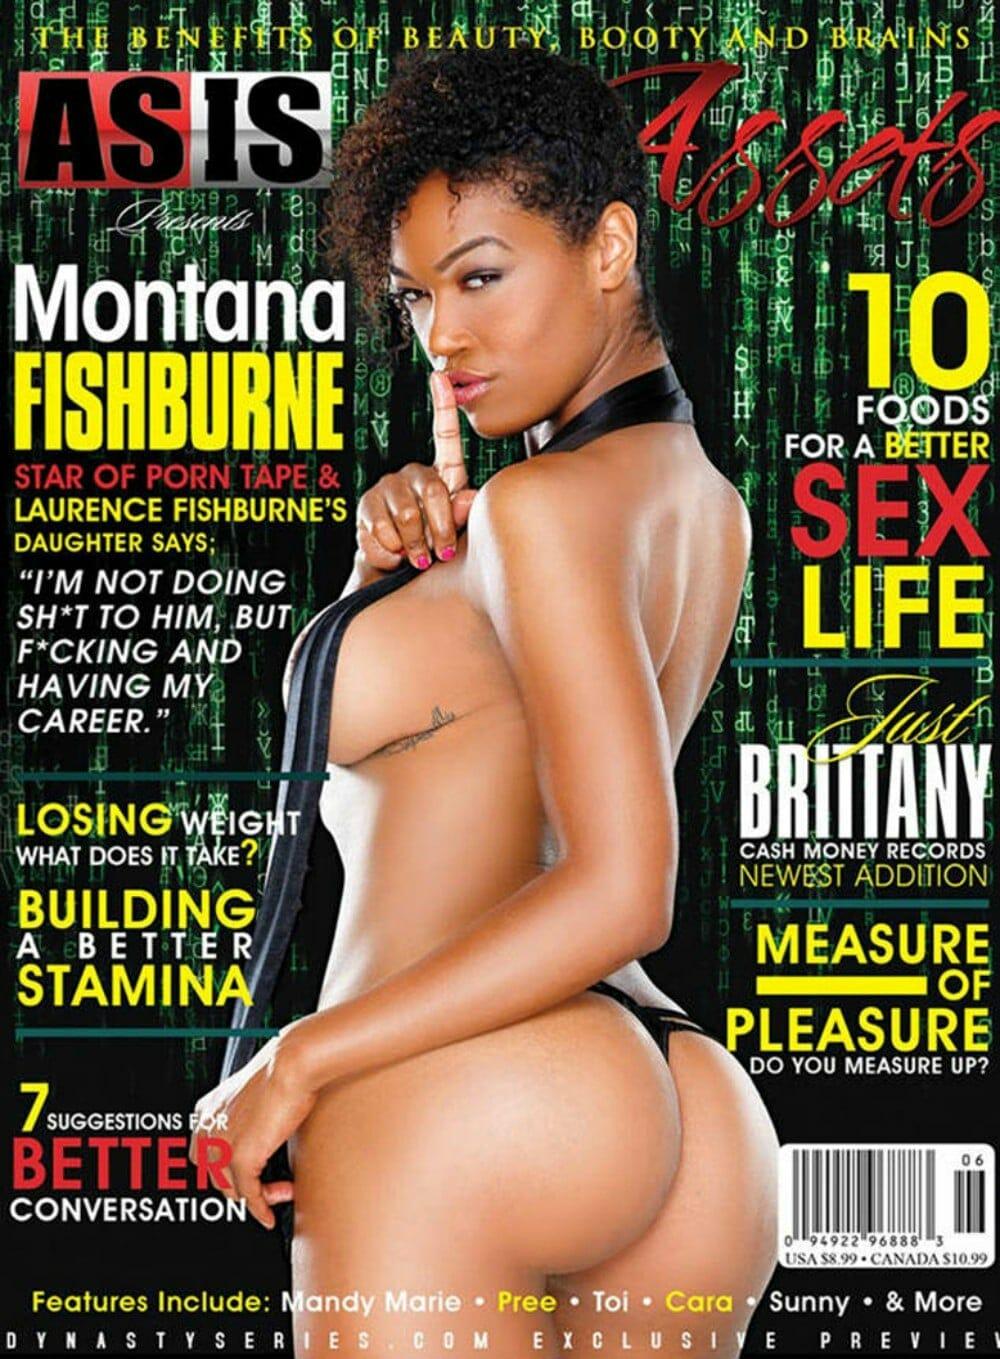 Fishburne porn tape sex quality pic